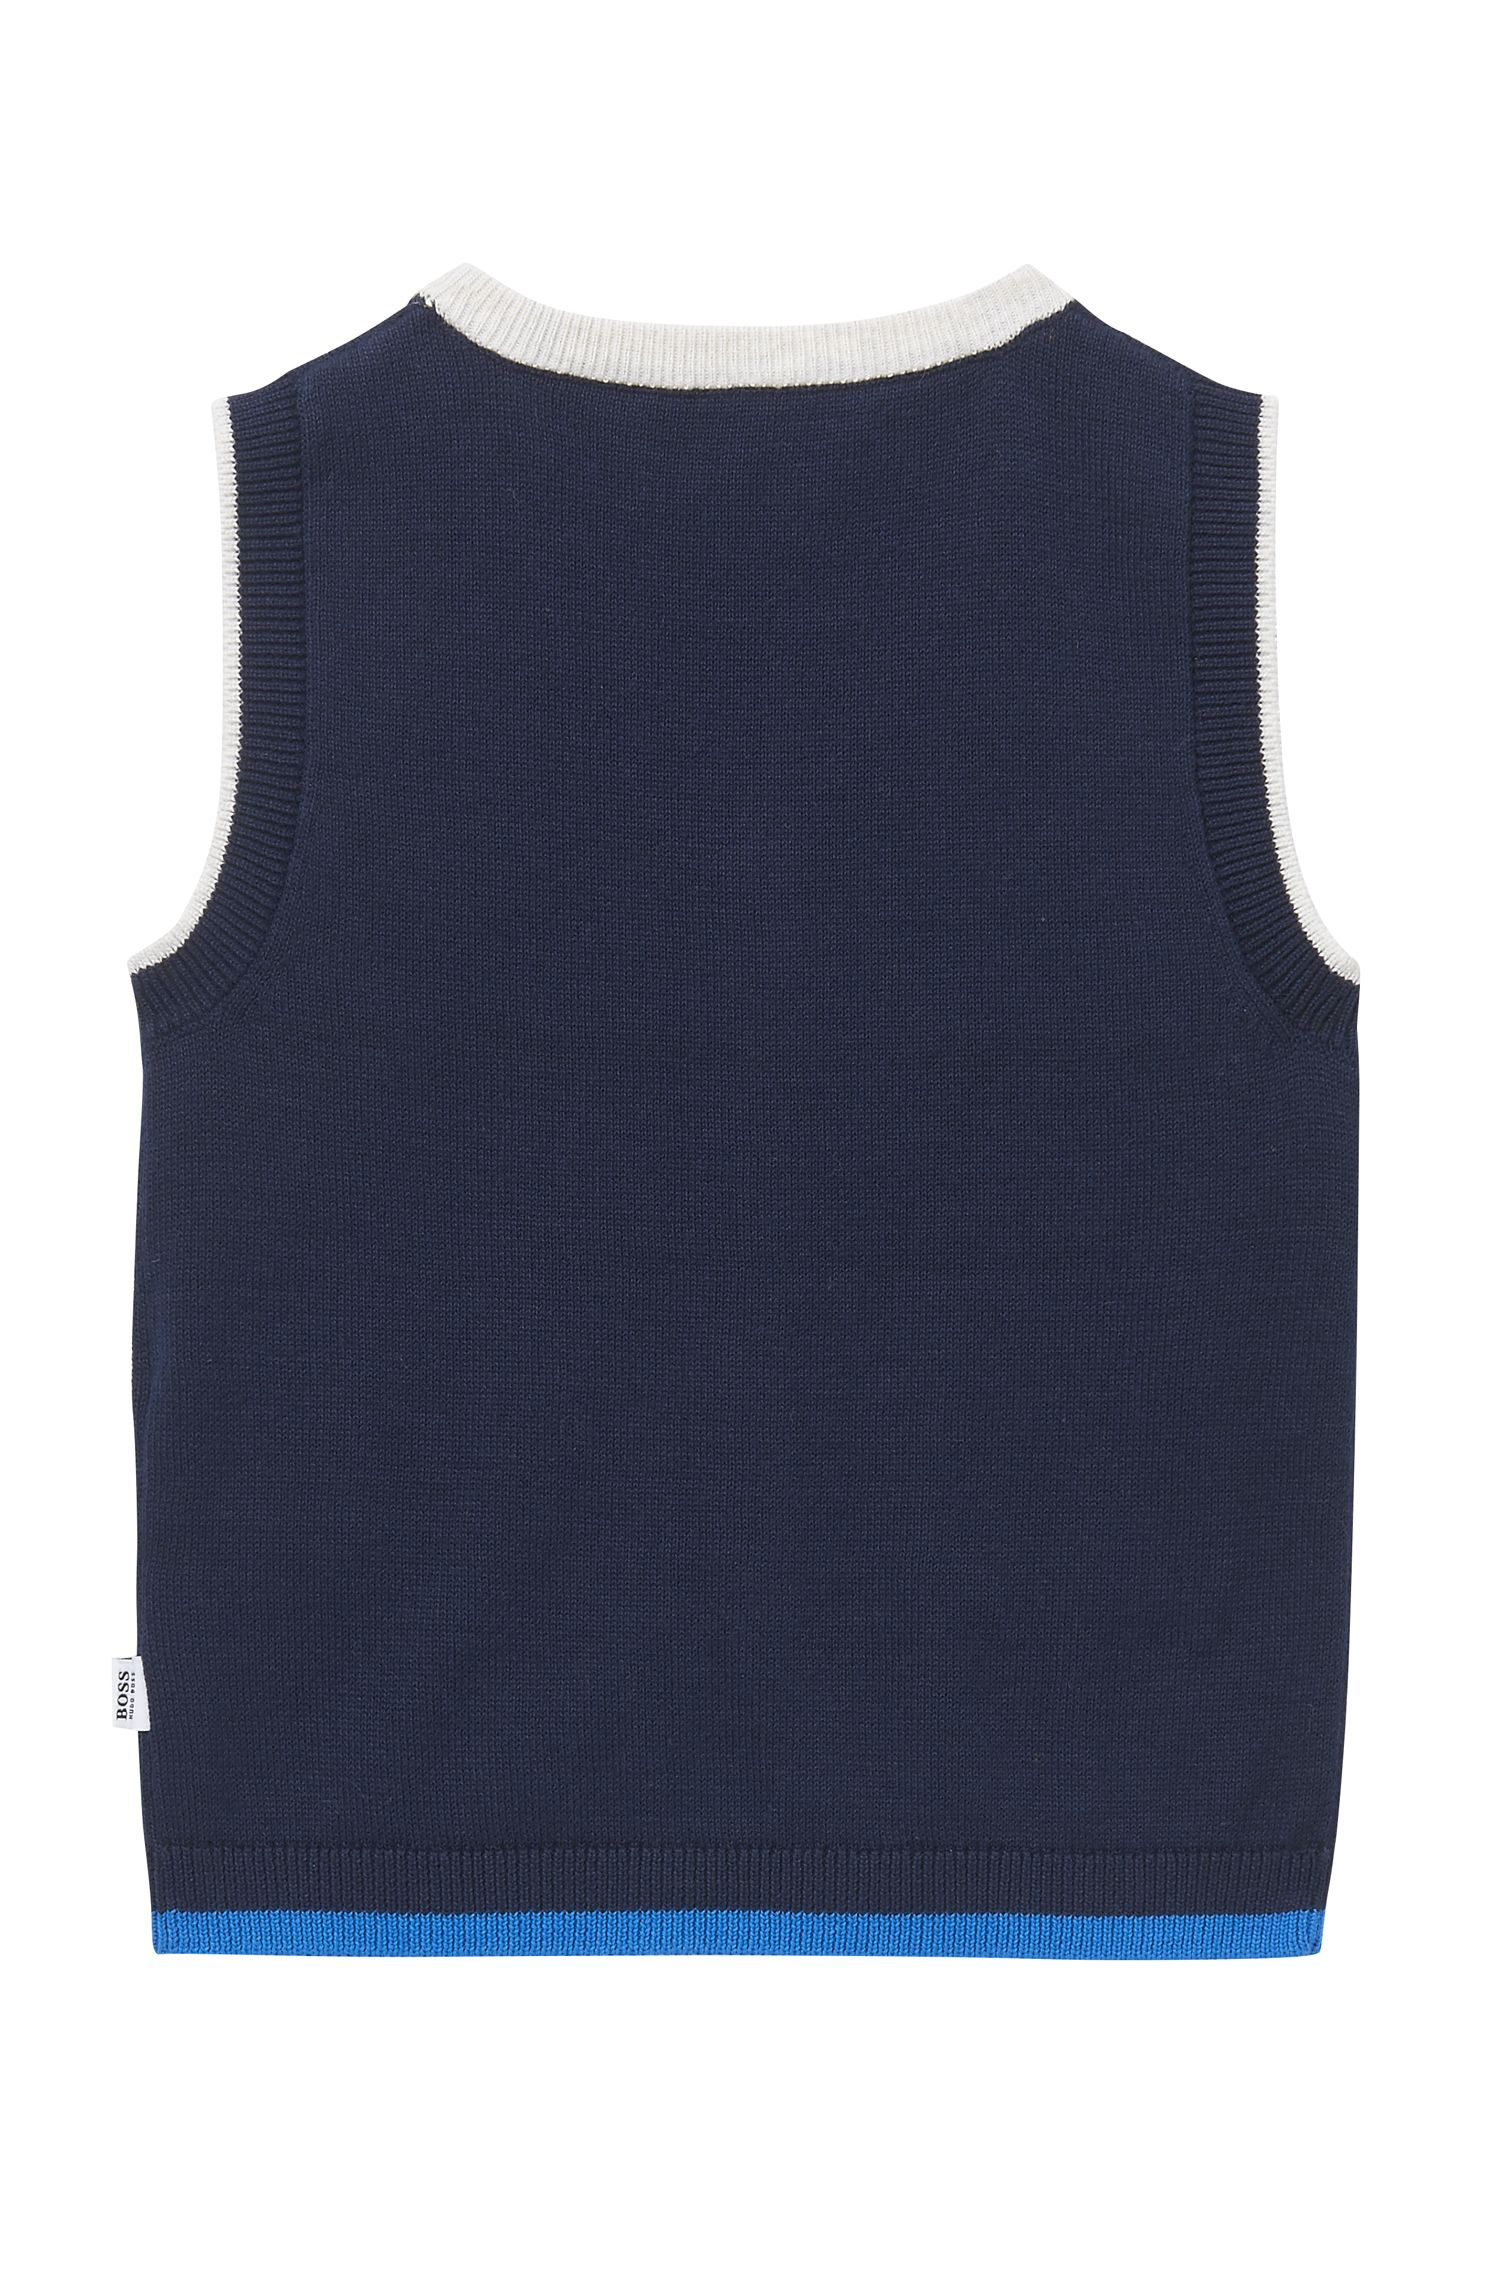 'J05523'   Toddler Stretch Cotton Blend Sweater Vest, Dark Blue